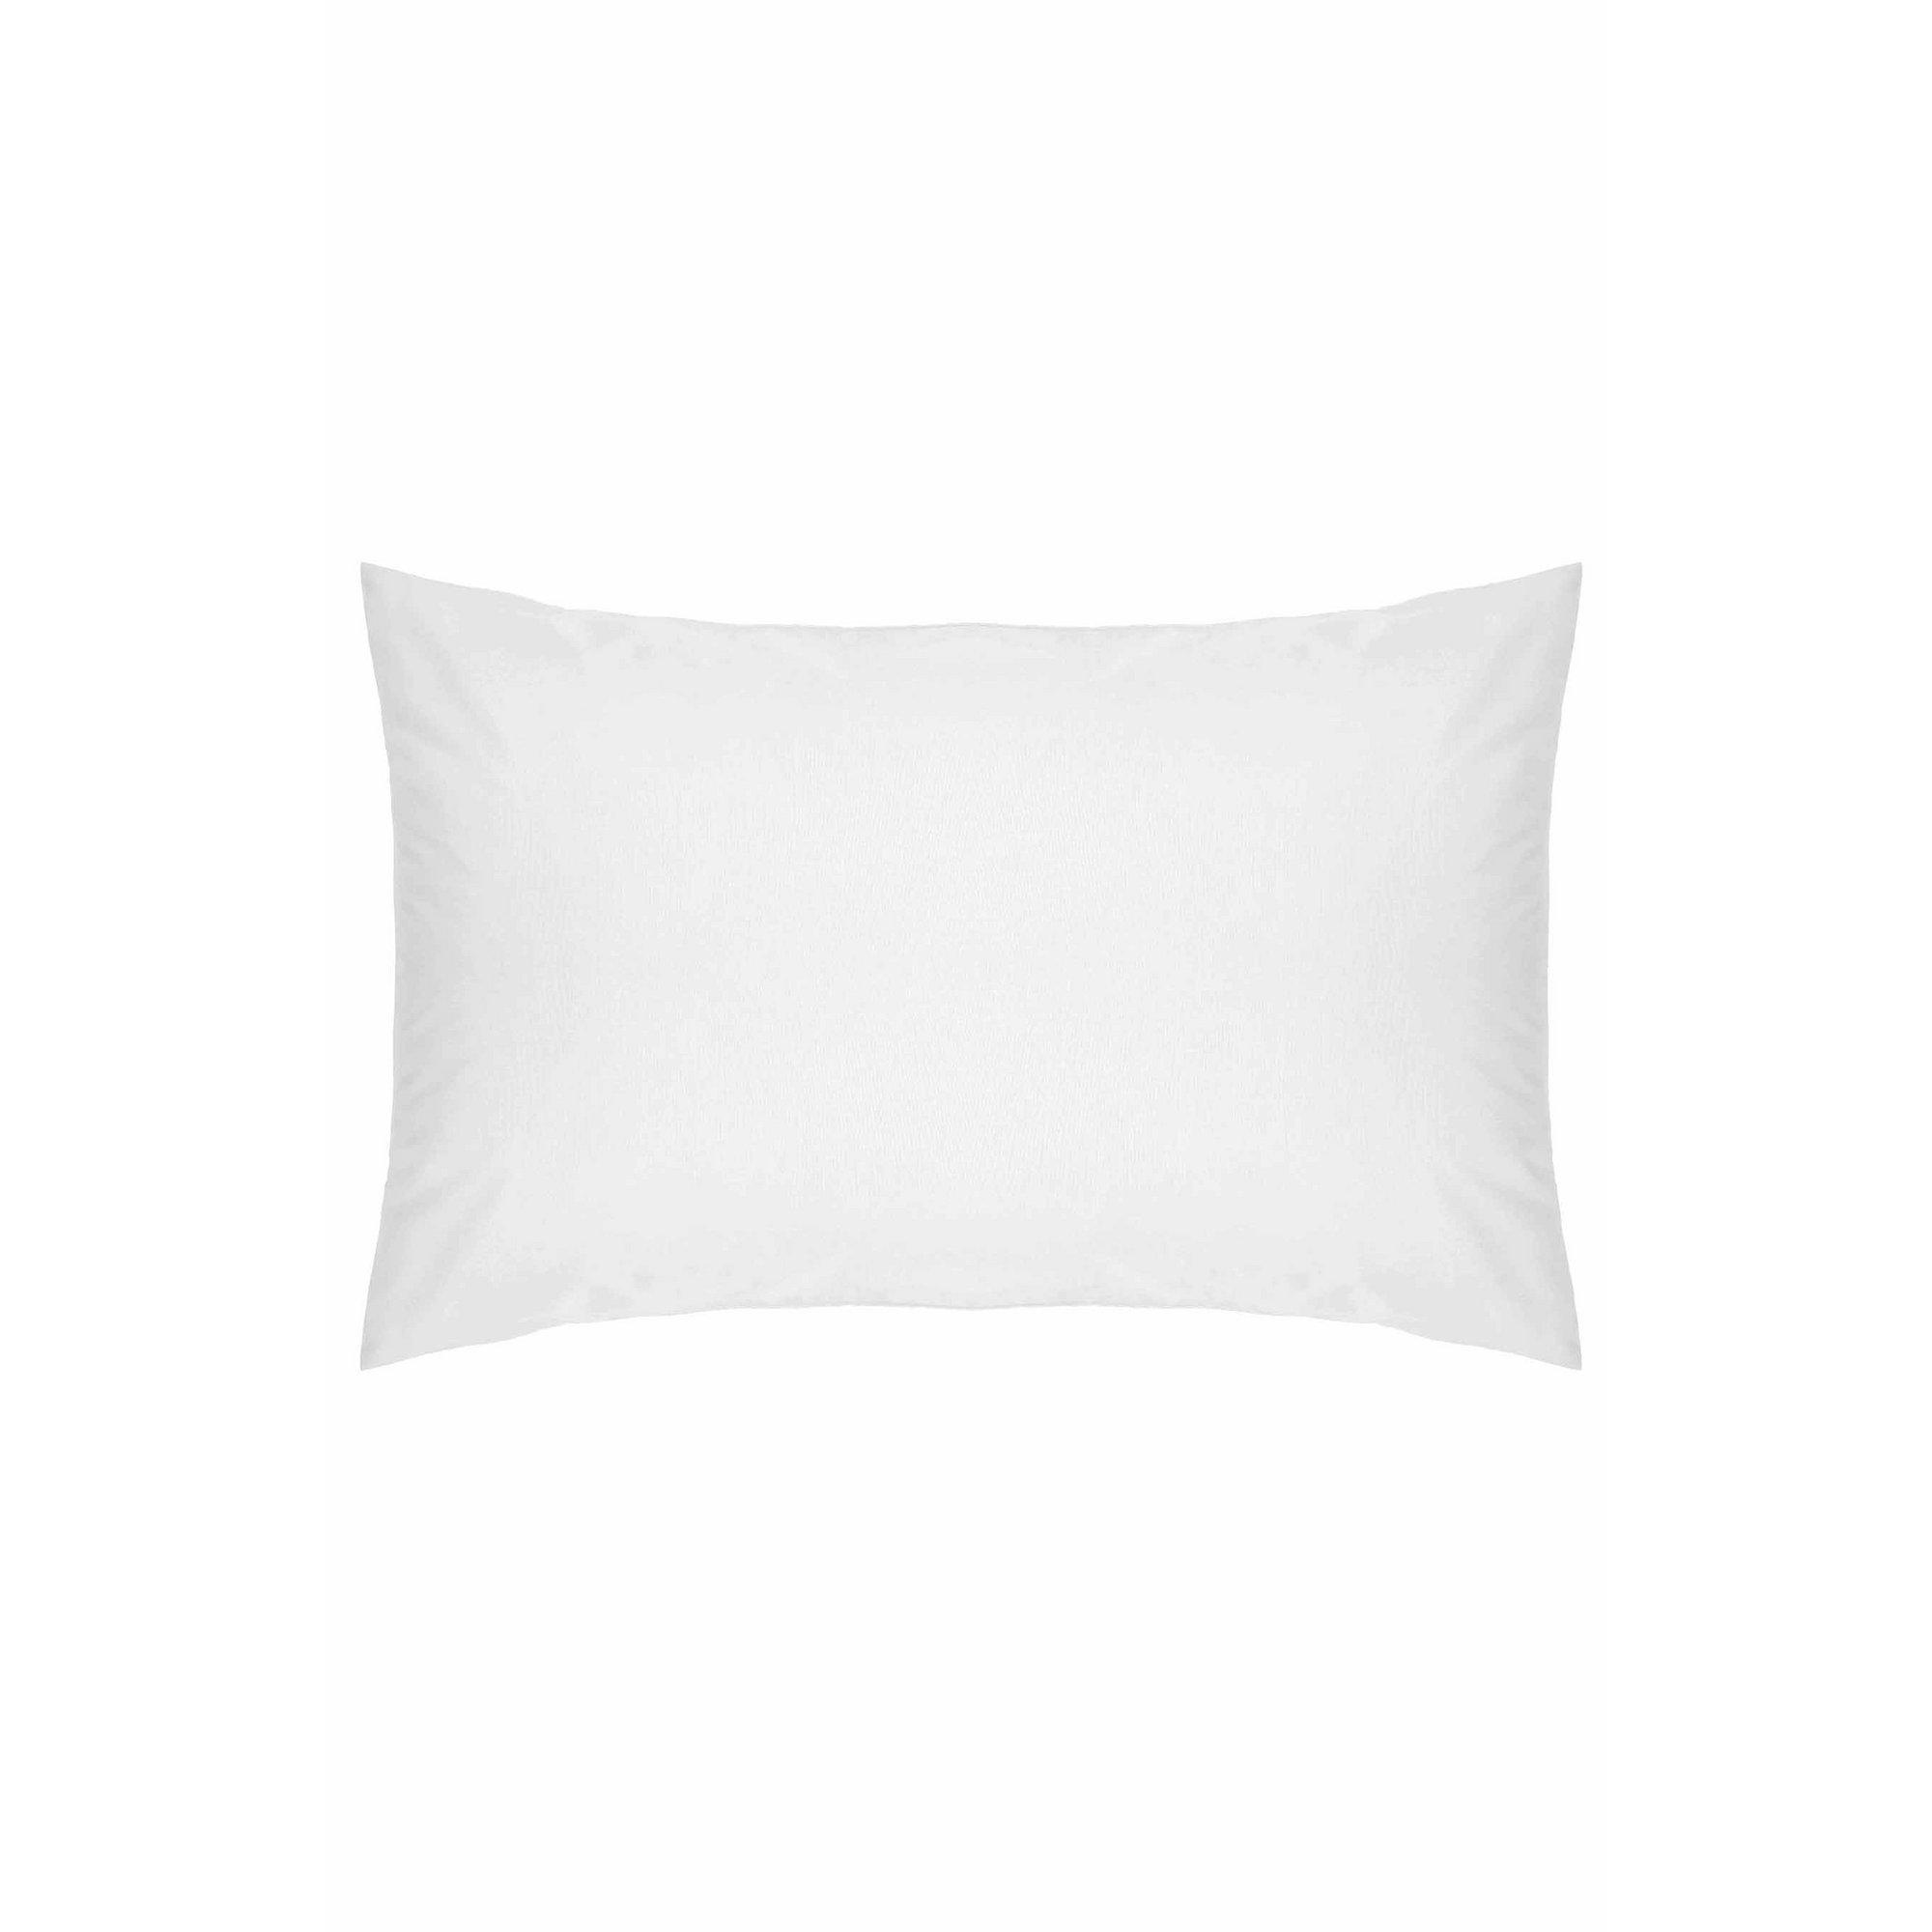 Image of 200 Count Percale Plain Hem Pillowcase